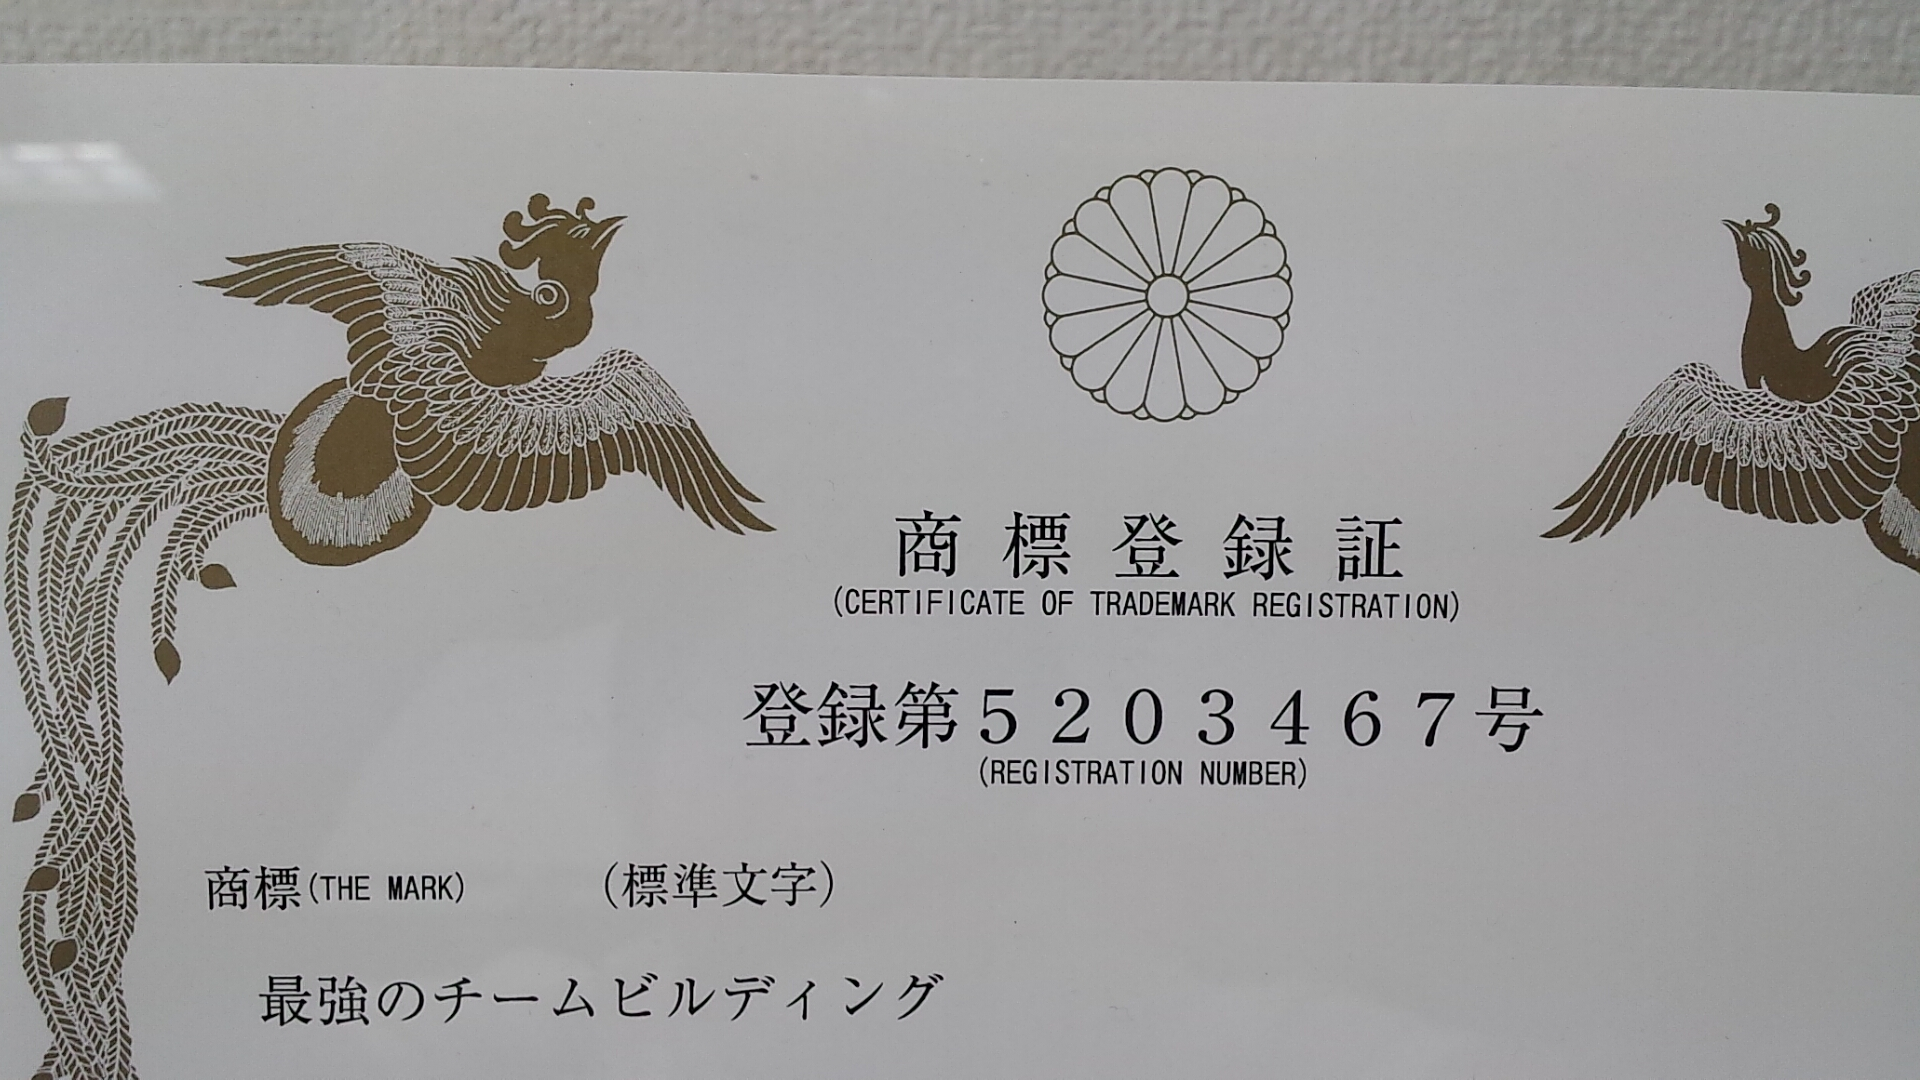 2014-08-20 01.11.15